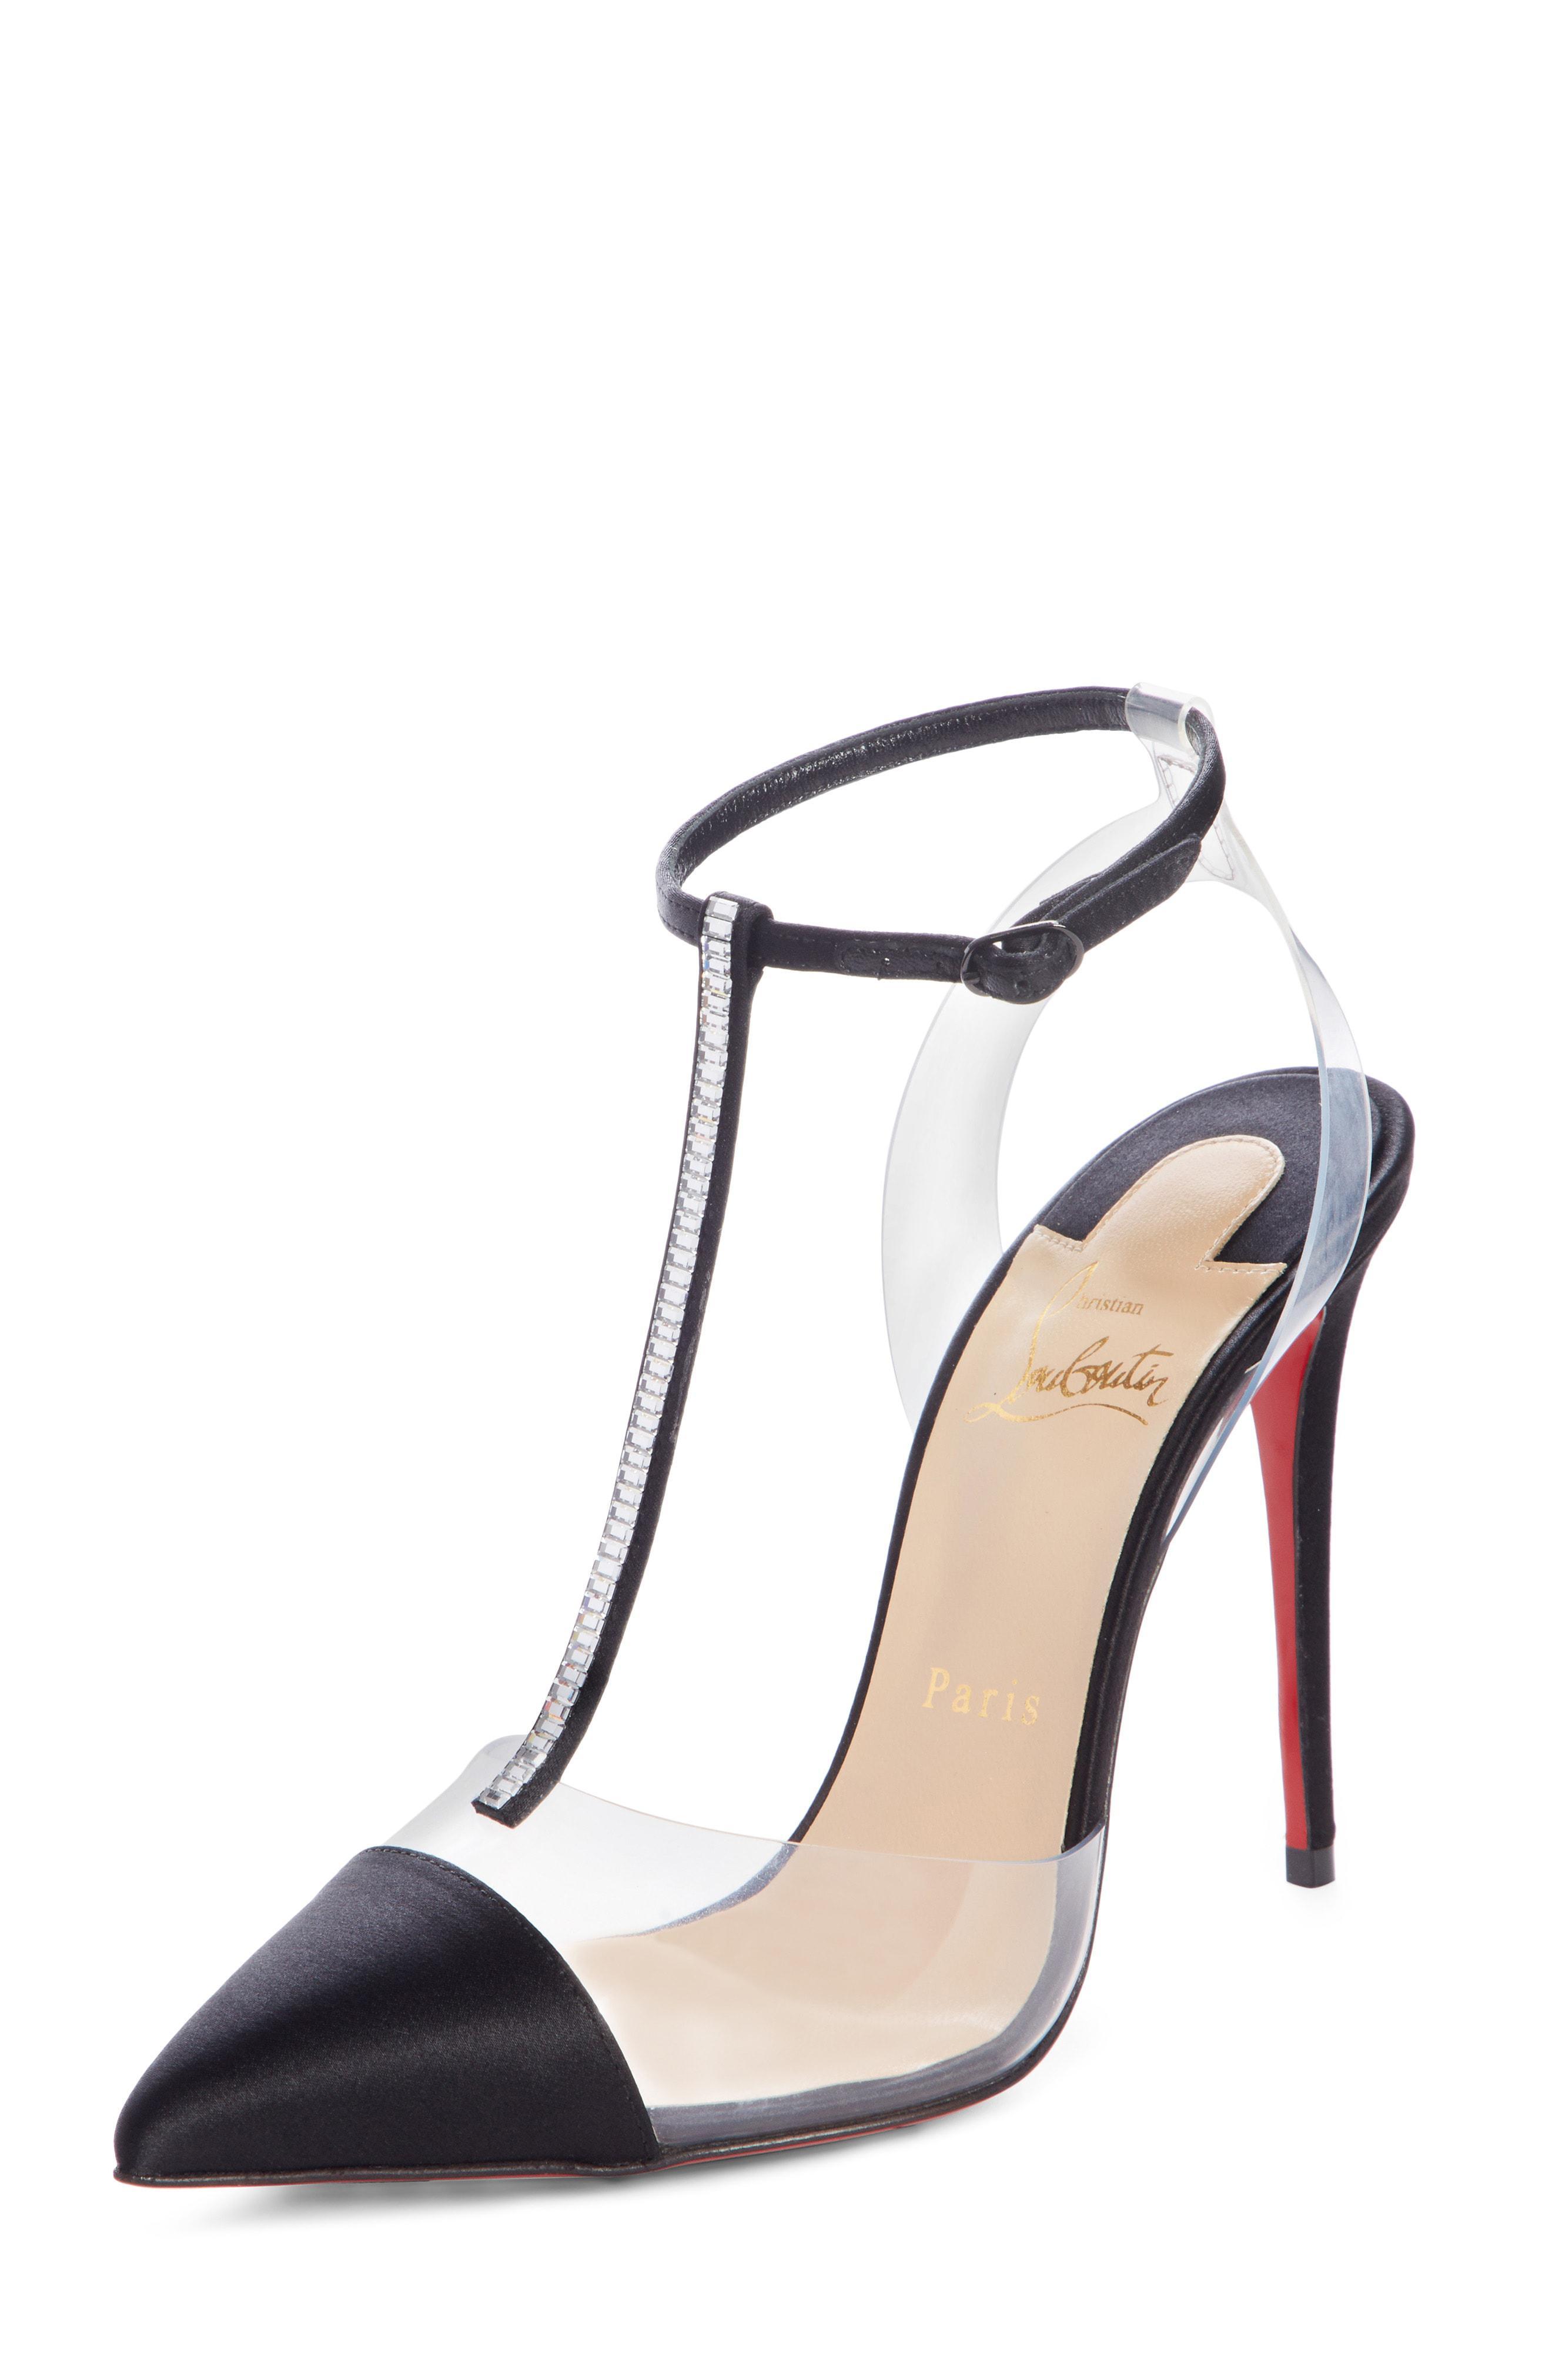 a37332103ddd Christian Louboutin. Women s Nosy Jewel Embellished T-strap Pump